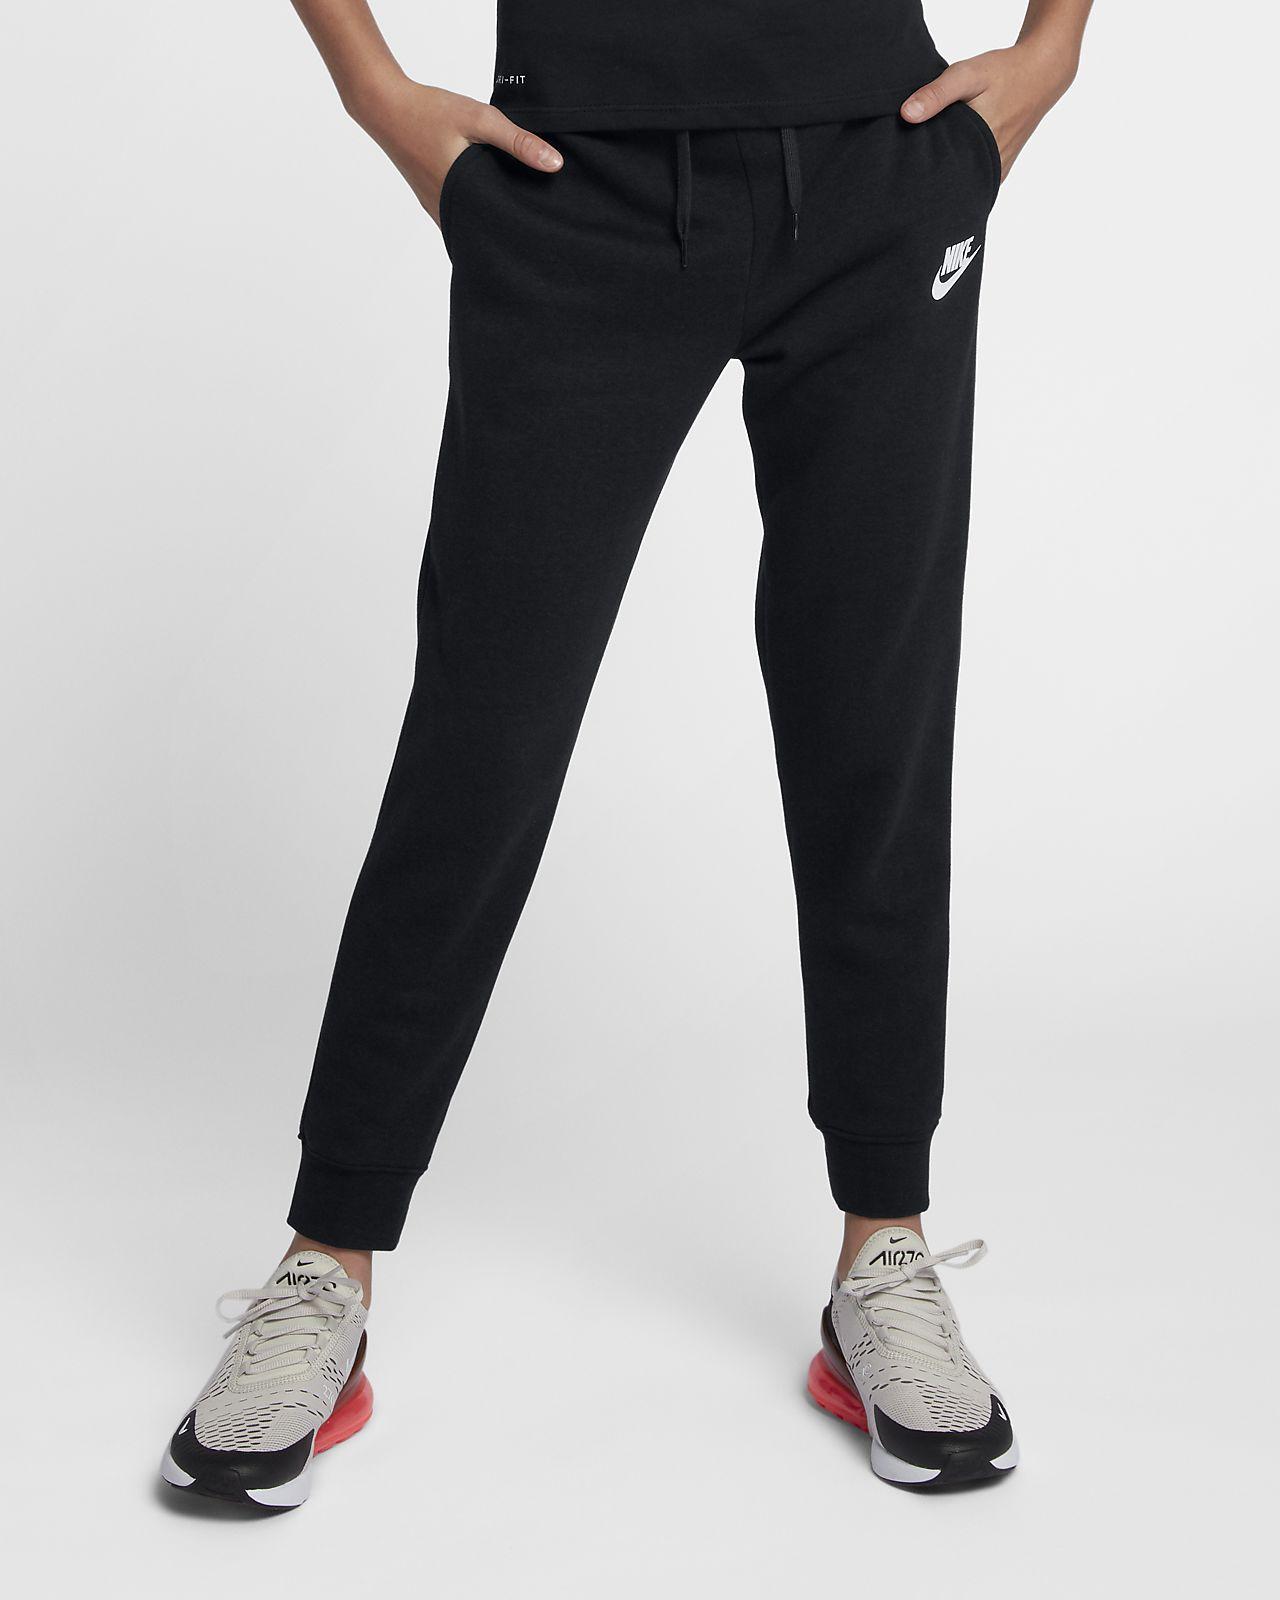 Брюки для девочек школьного возраста Nike Sportswear